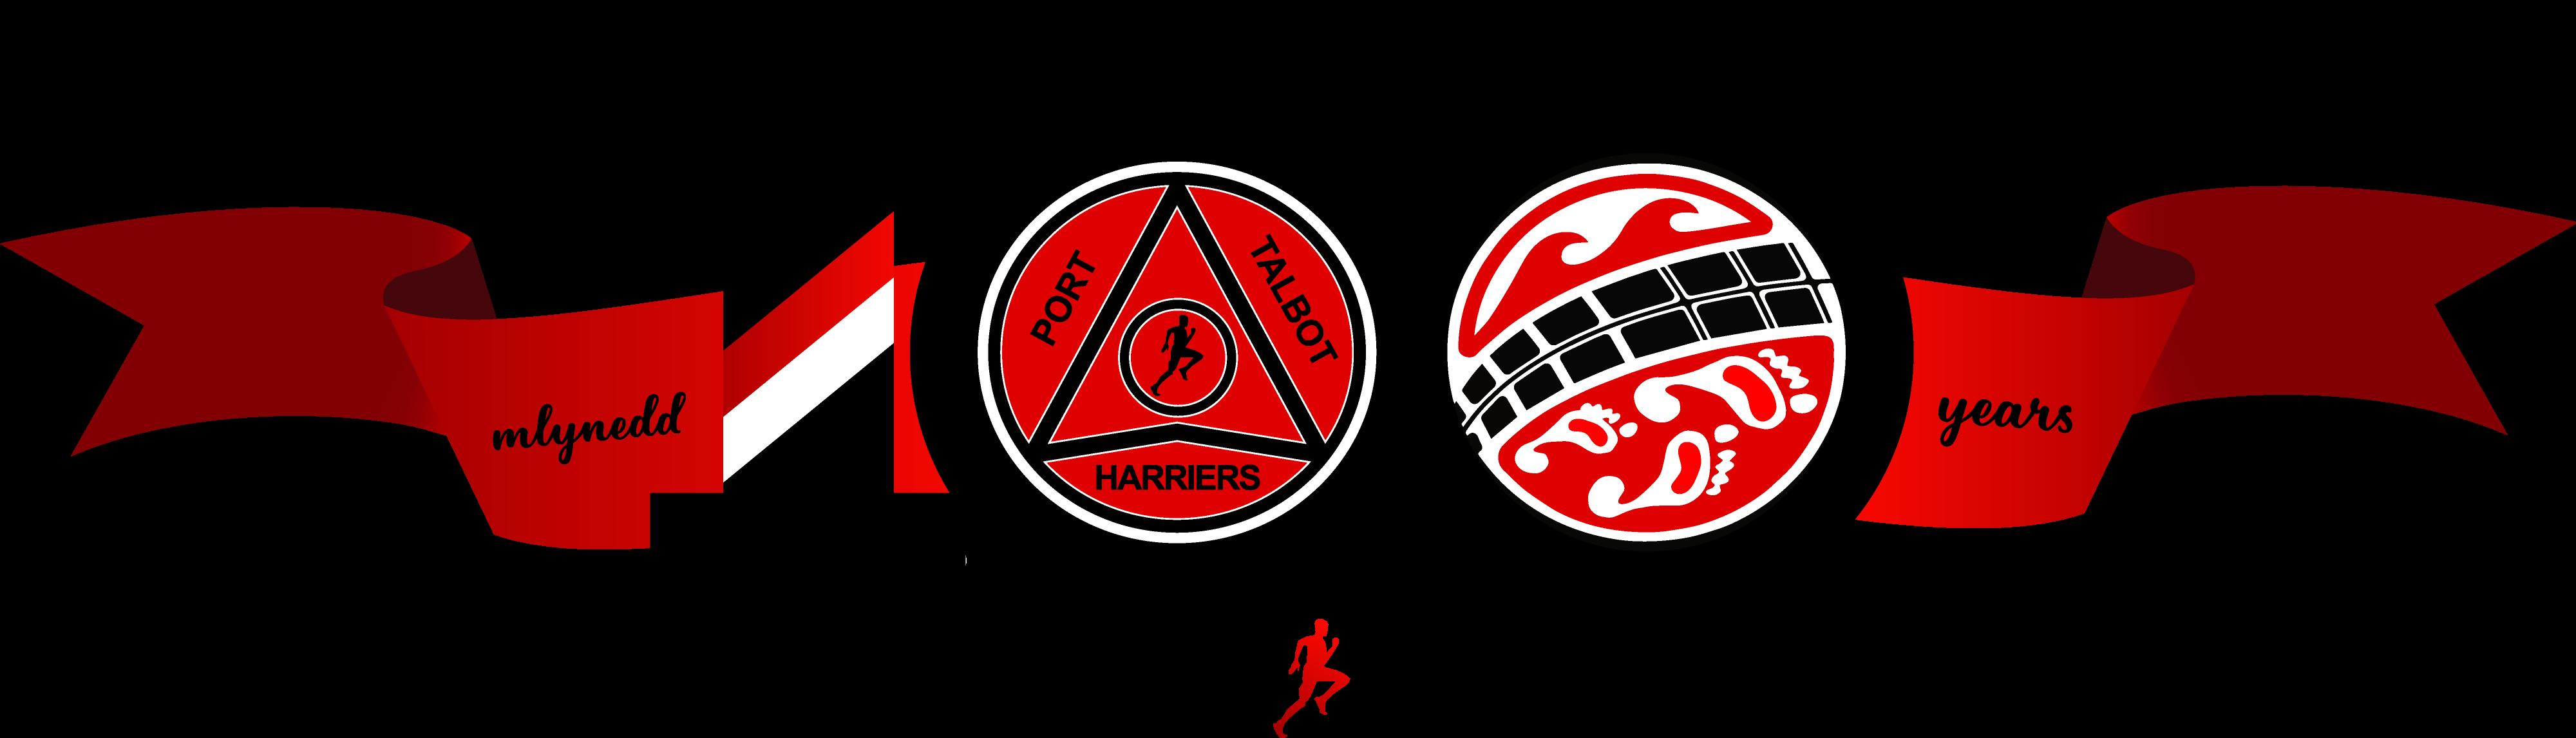 Port Talbot Harriers Centenary 1921-2021